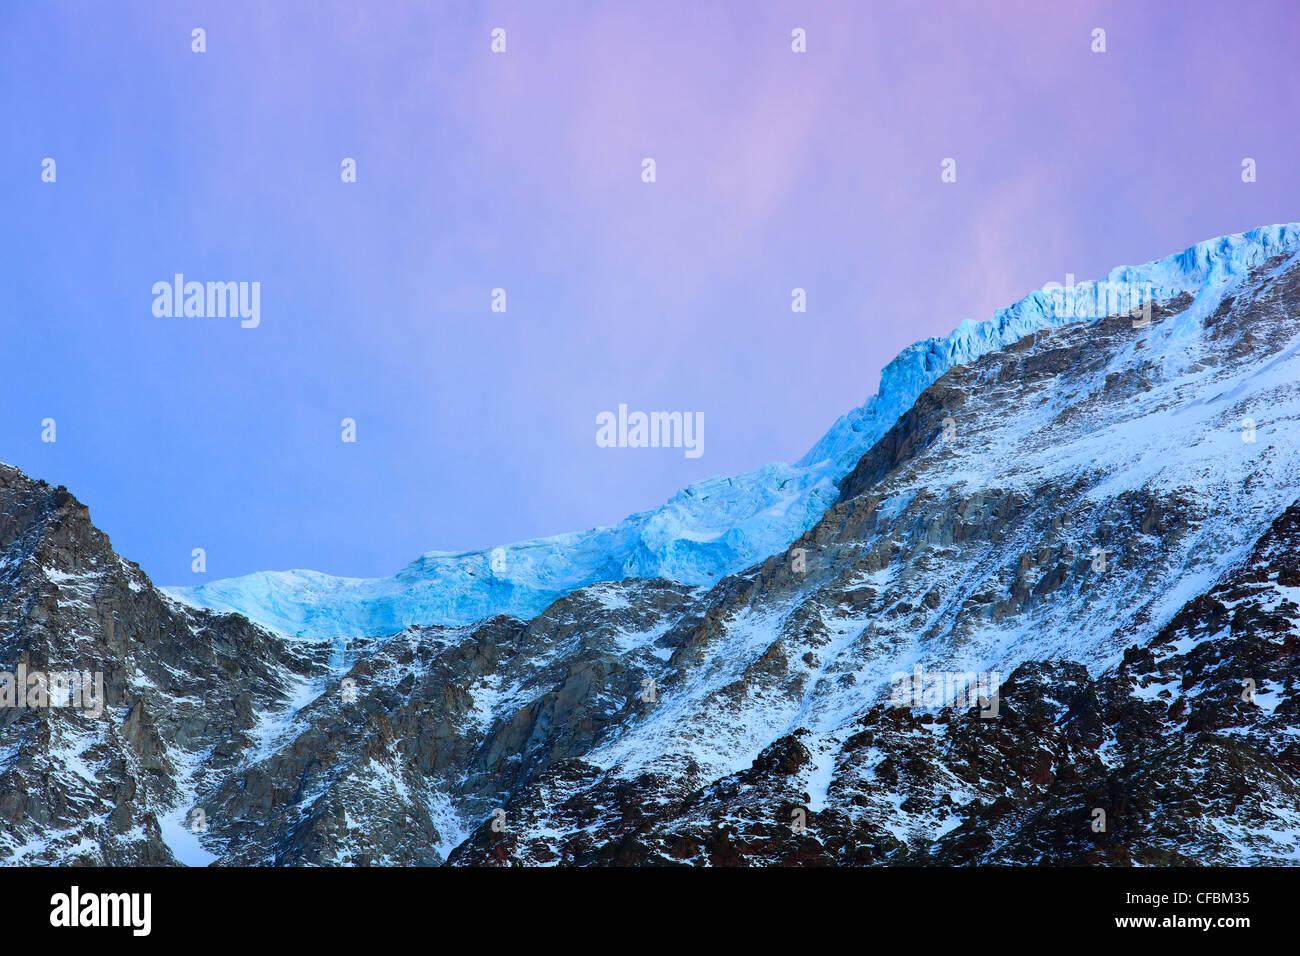 Evening mood, slopes, inclinations, glacier, slope glacier, Lötschental, Valais, Switzerland, Europe, alpine, - Stock Image